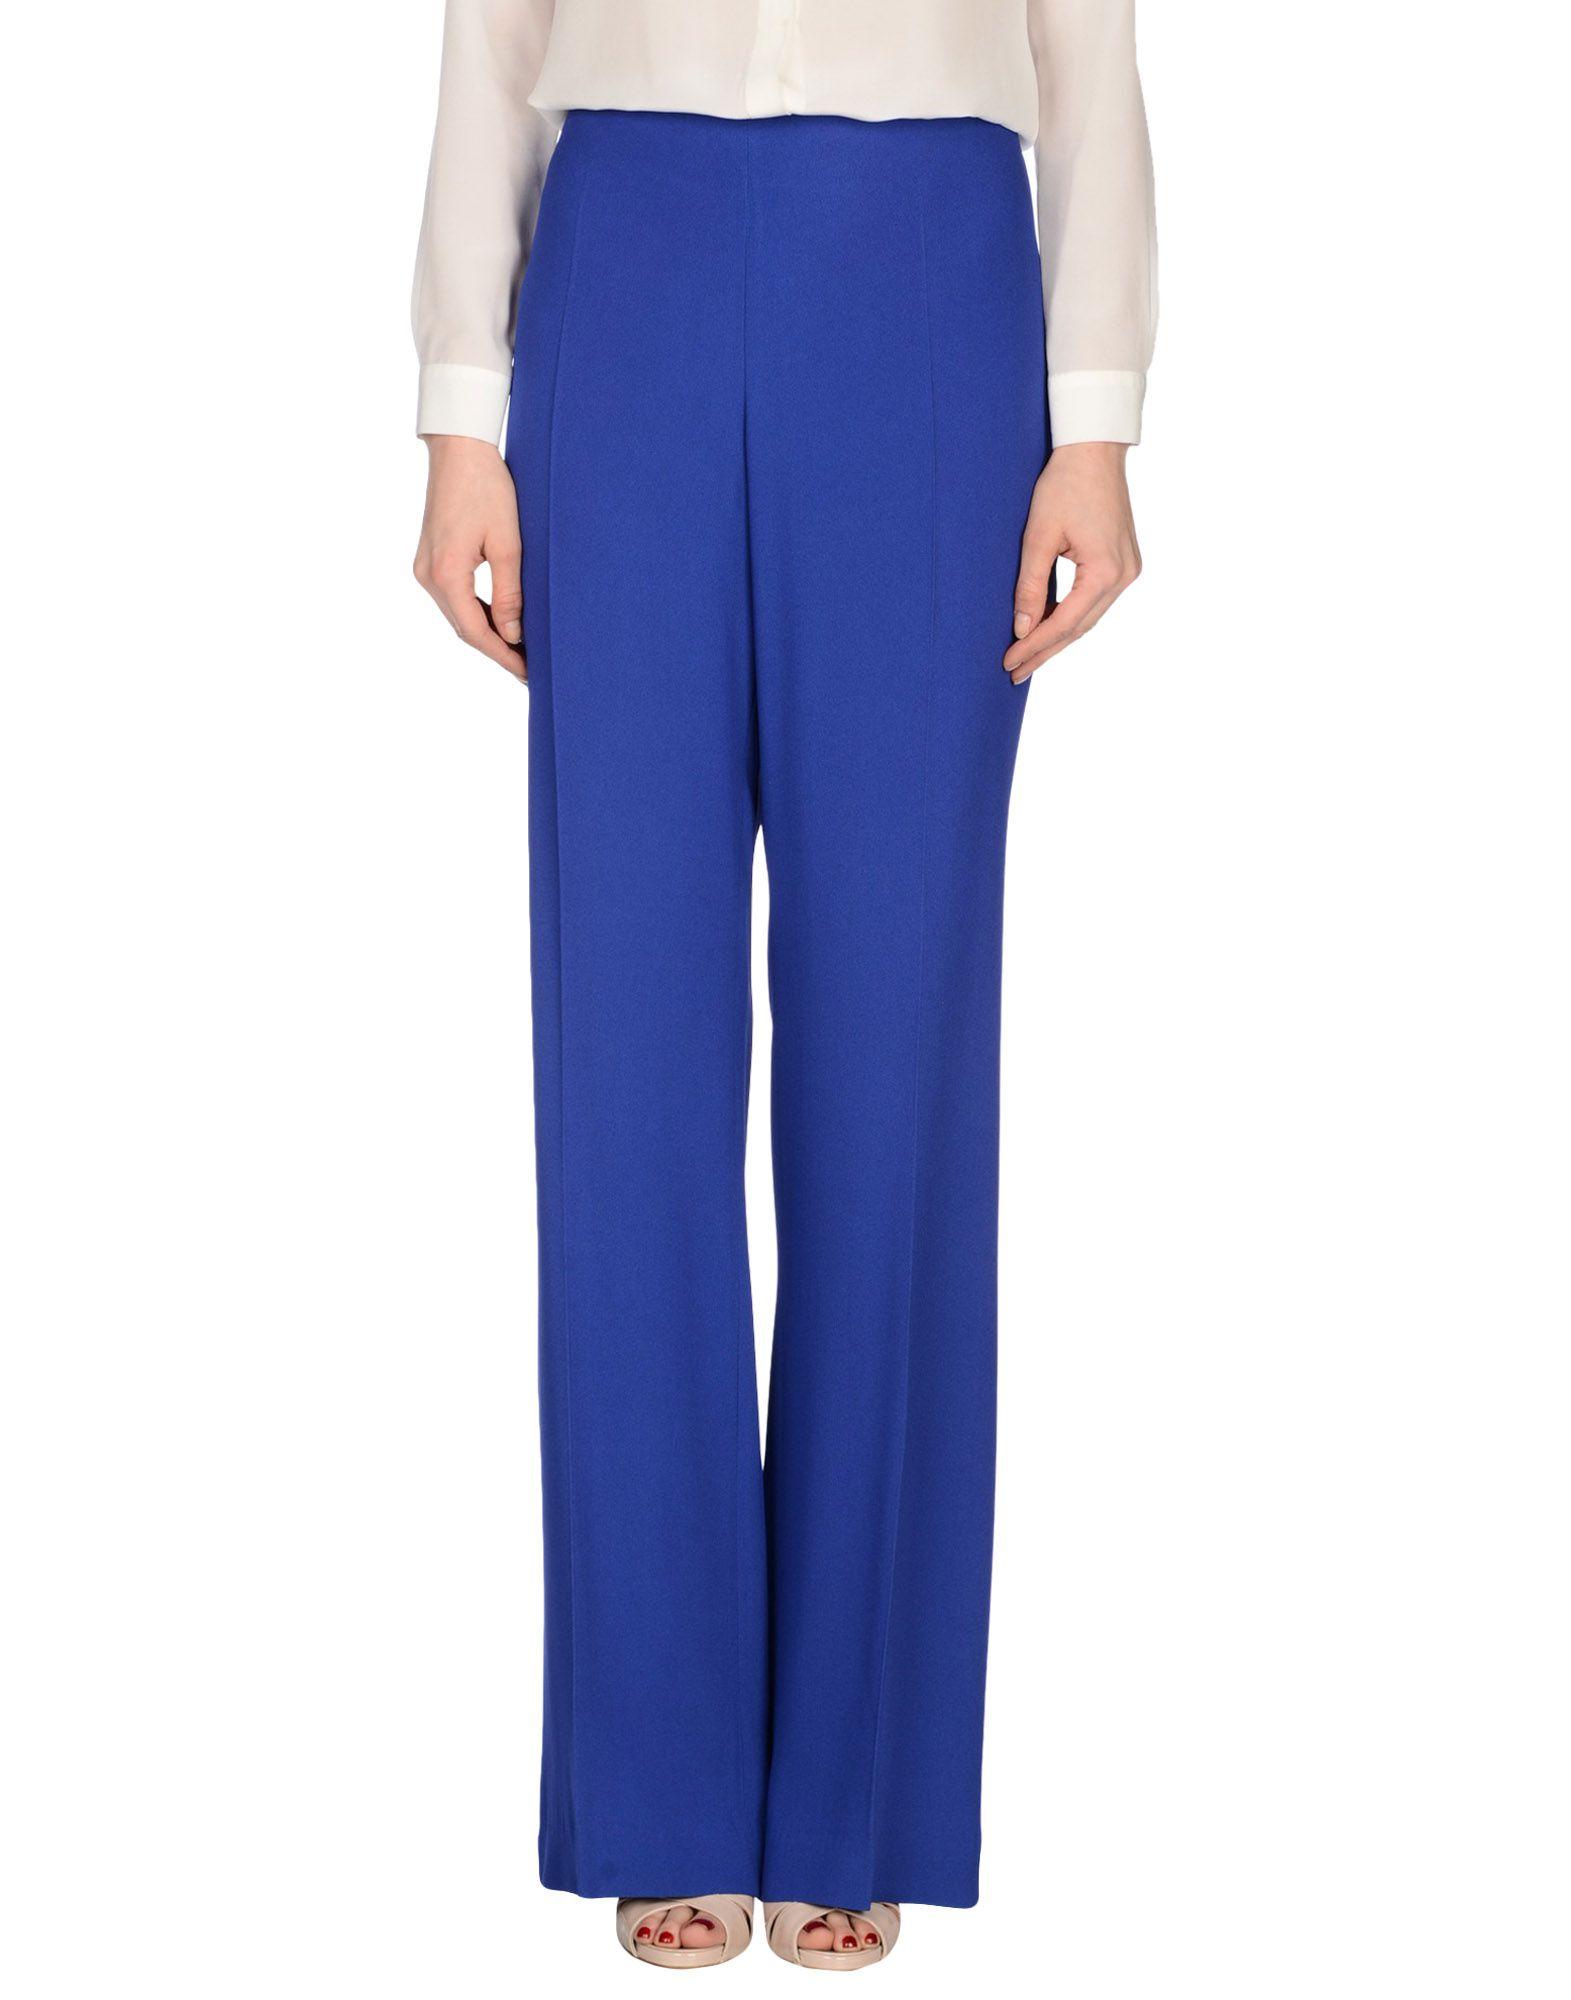 CLIPS Damen Hose Farbe Blau Größe 7